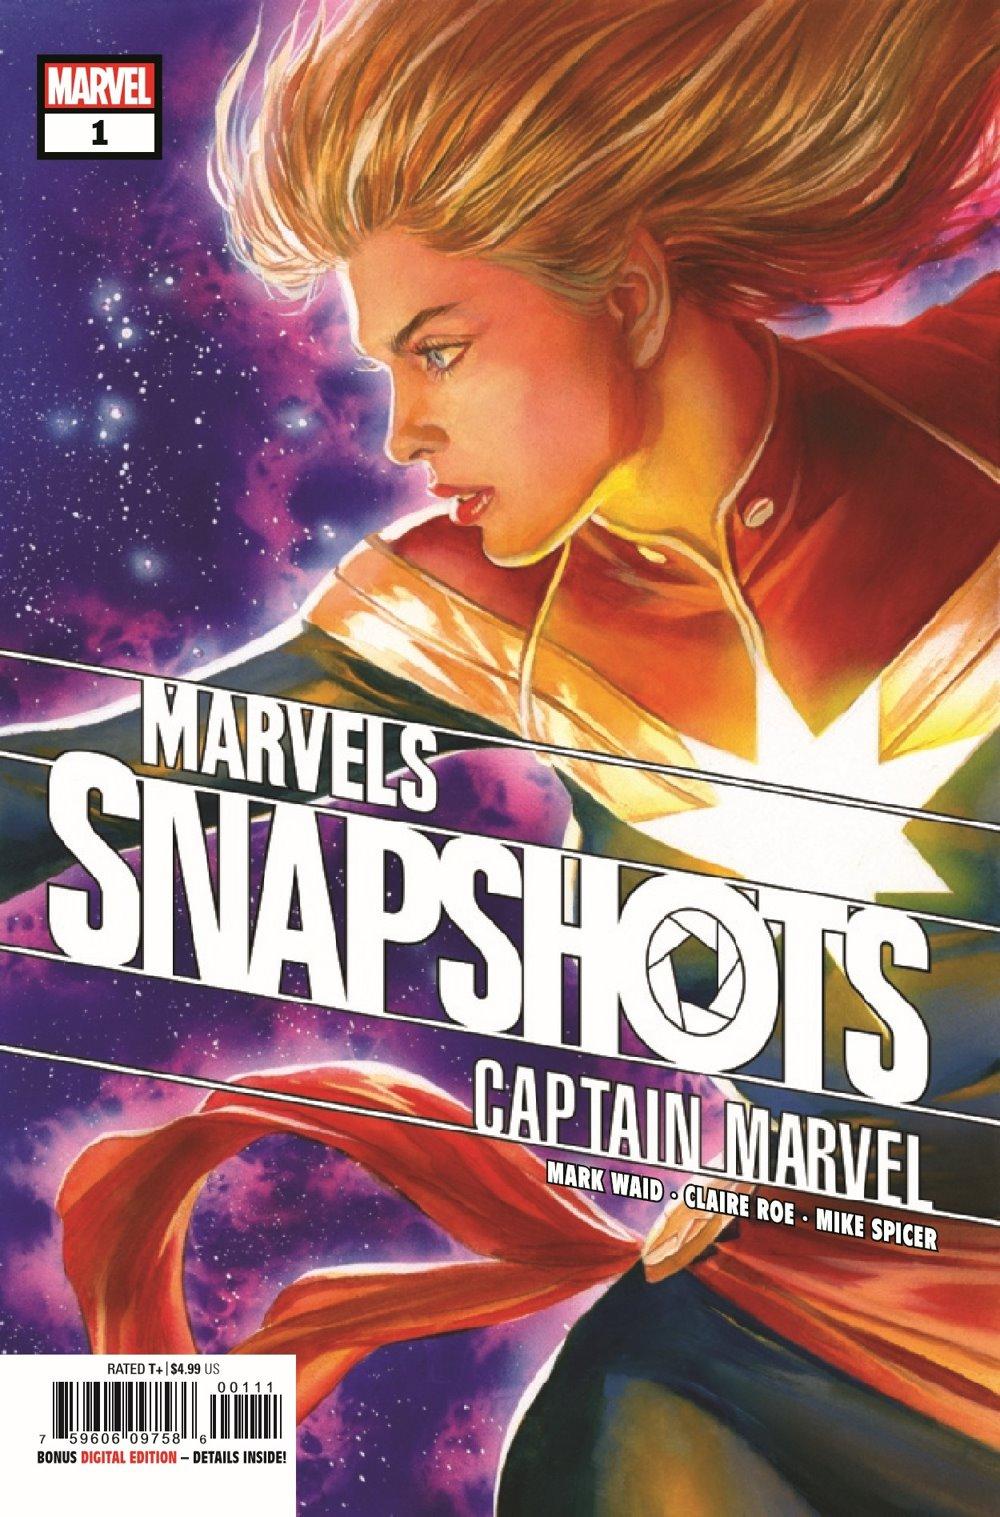 CAPMARVSNAP2020001_Preview-1 ComicList Previews: CAPTAIN MARVEL MARVELS SNAPSHOTS #1